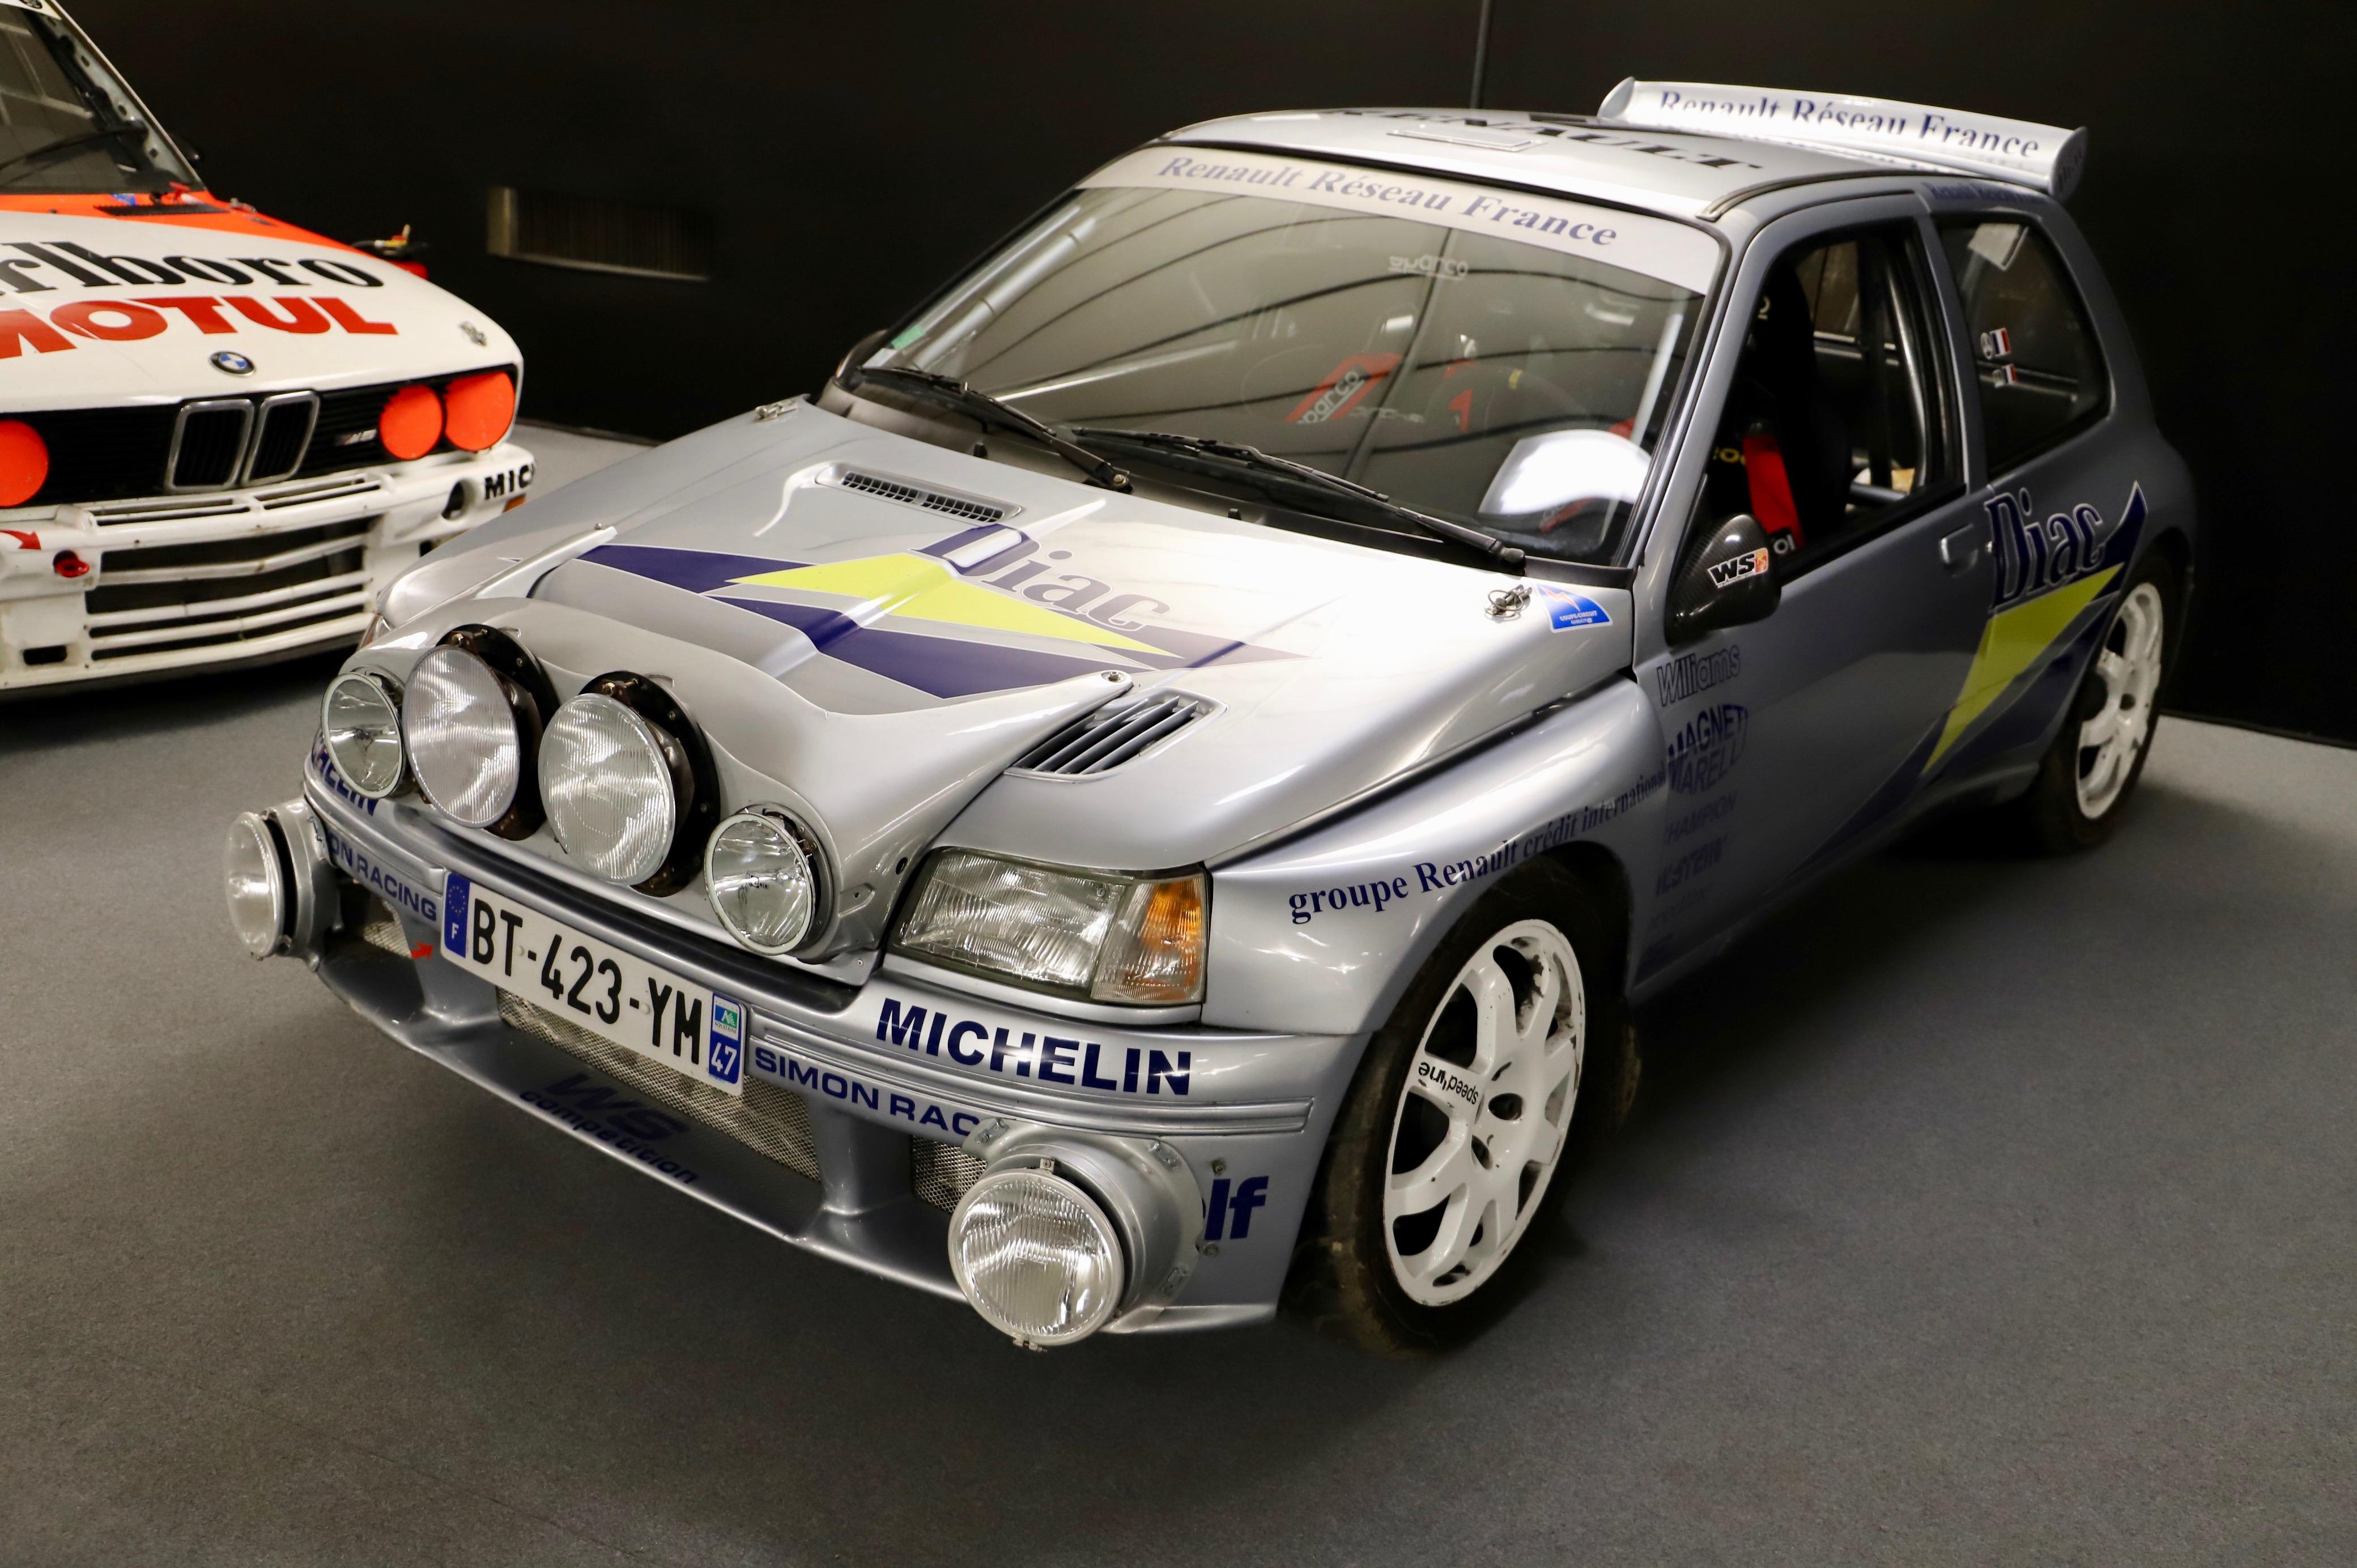 Renault Clio Maxi Kit - Ragnotti - 1995 - La Parisienne 2021 - Motorcars Artcurial - photo Ludo Ferrari